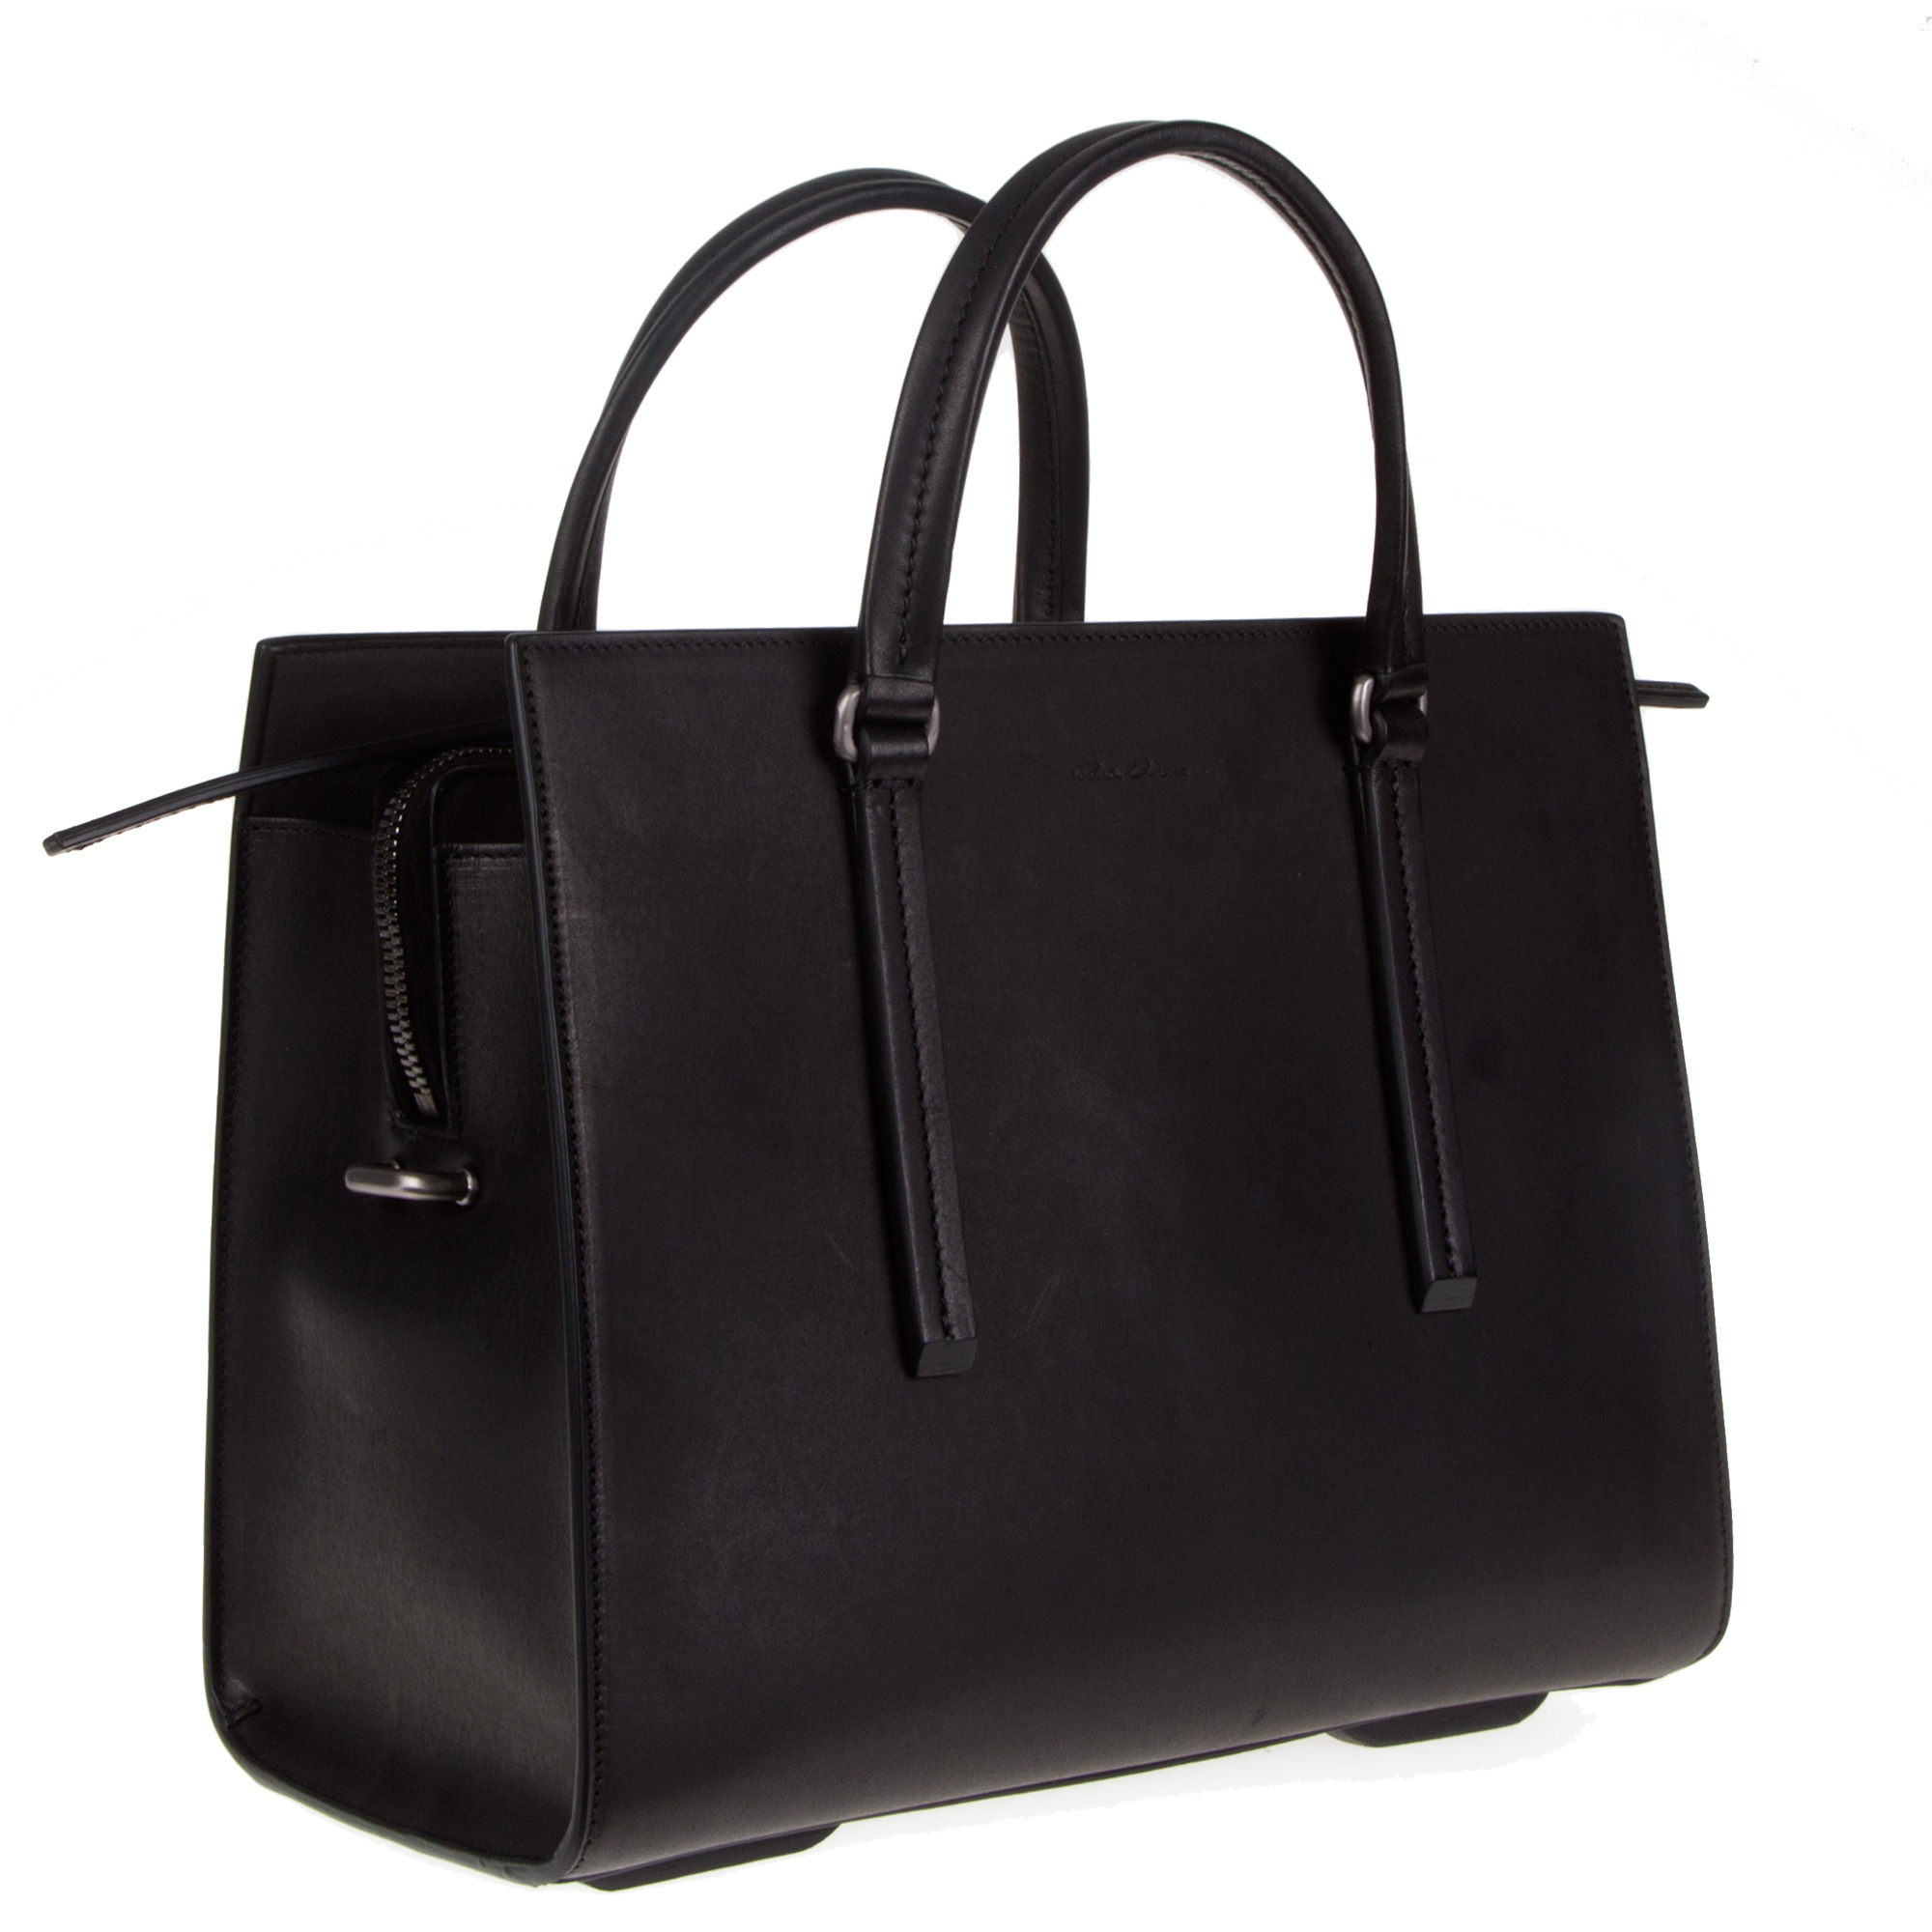 Rick Owens Pre-owned - Leather handbag wswnuHVba7